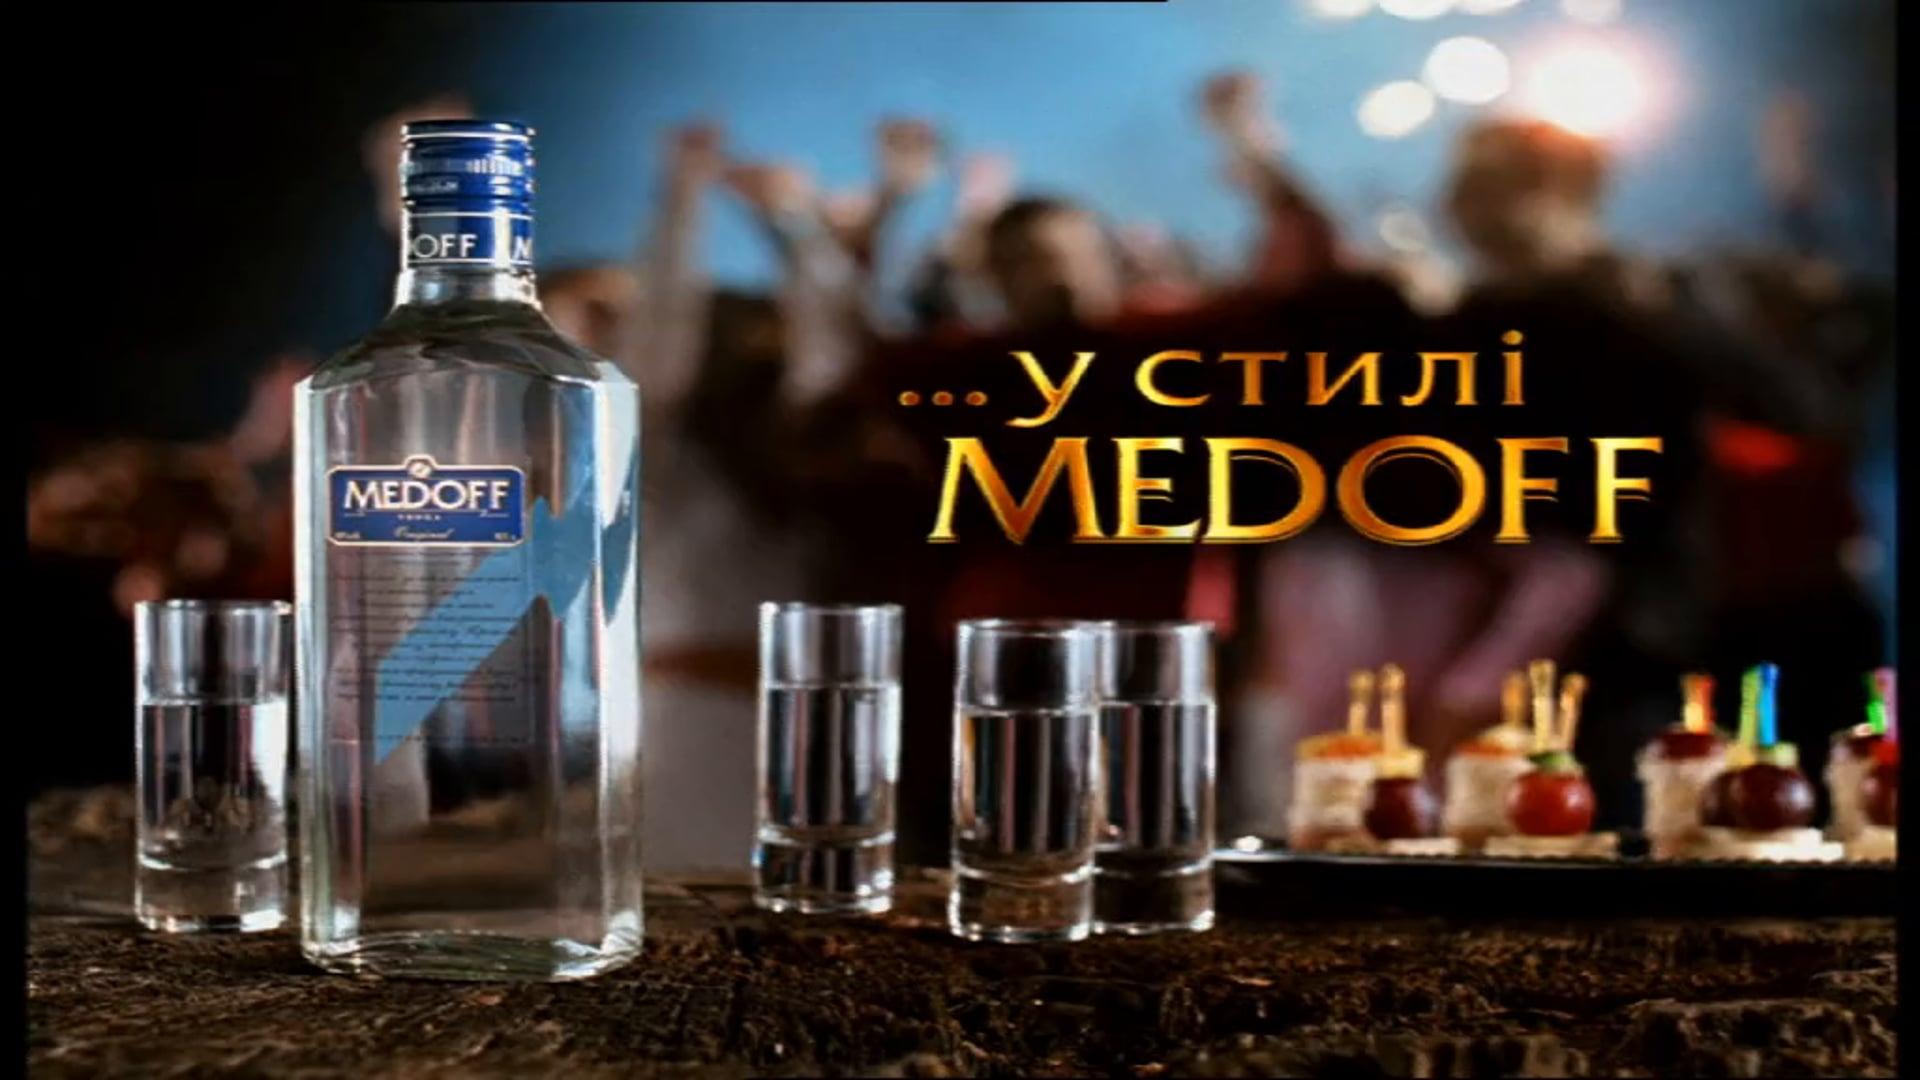 Medoff party